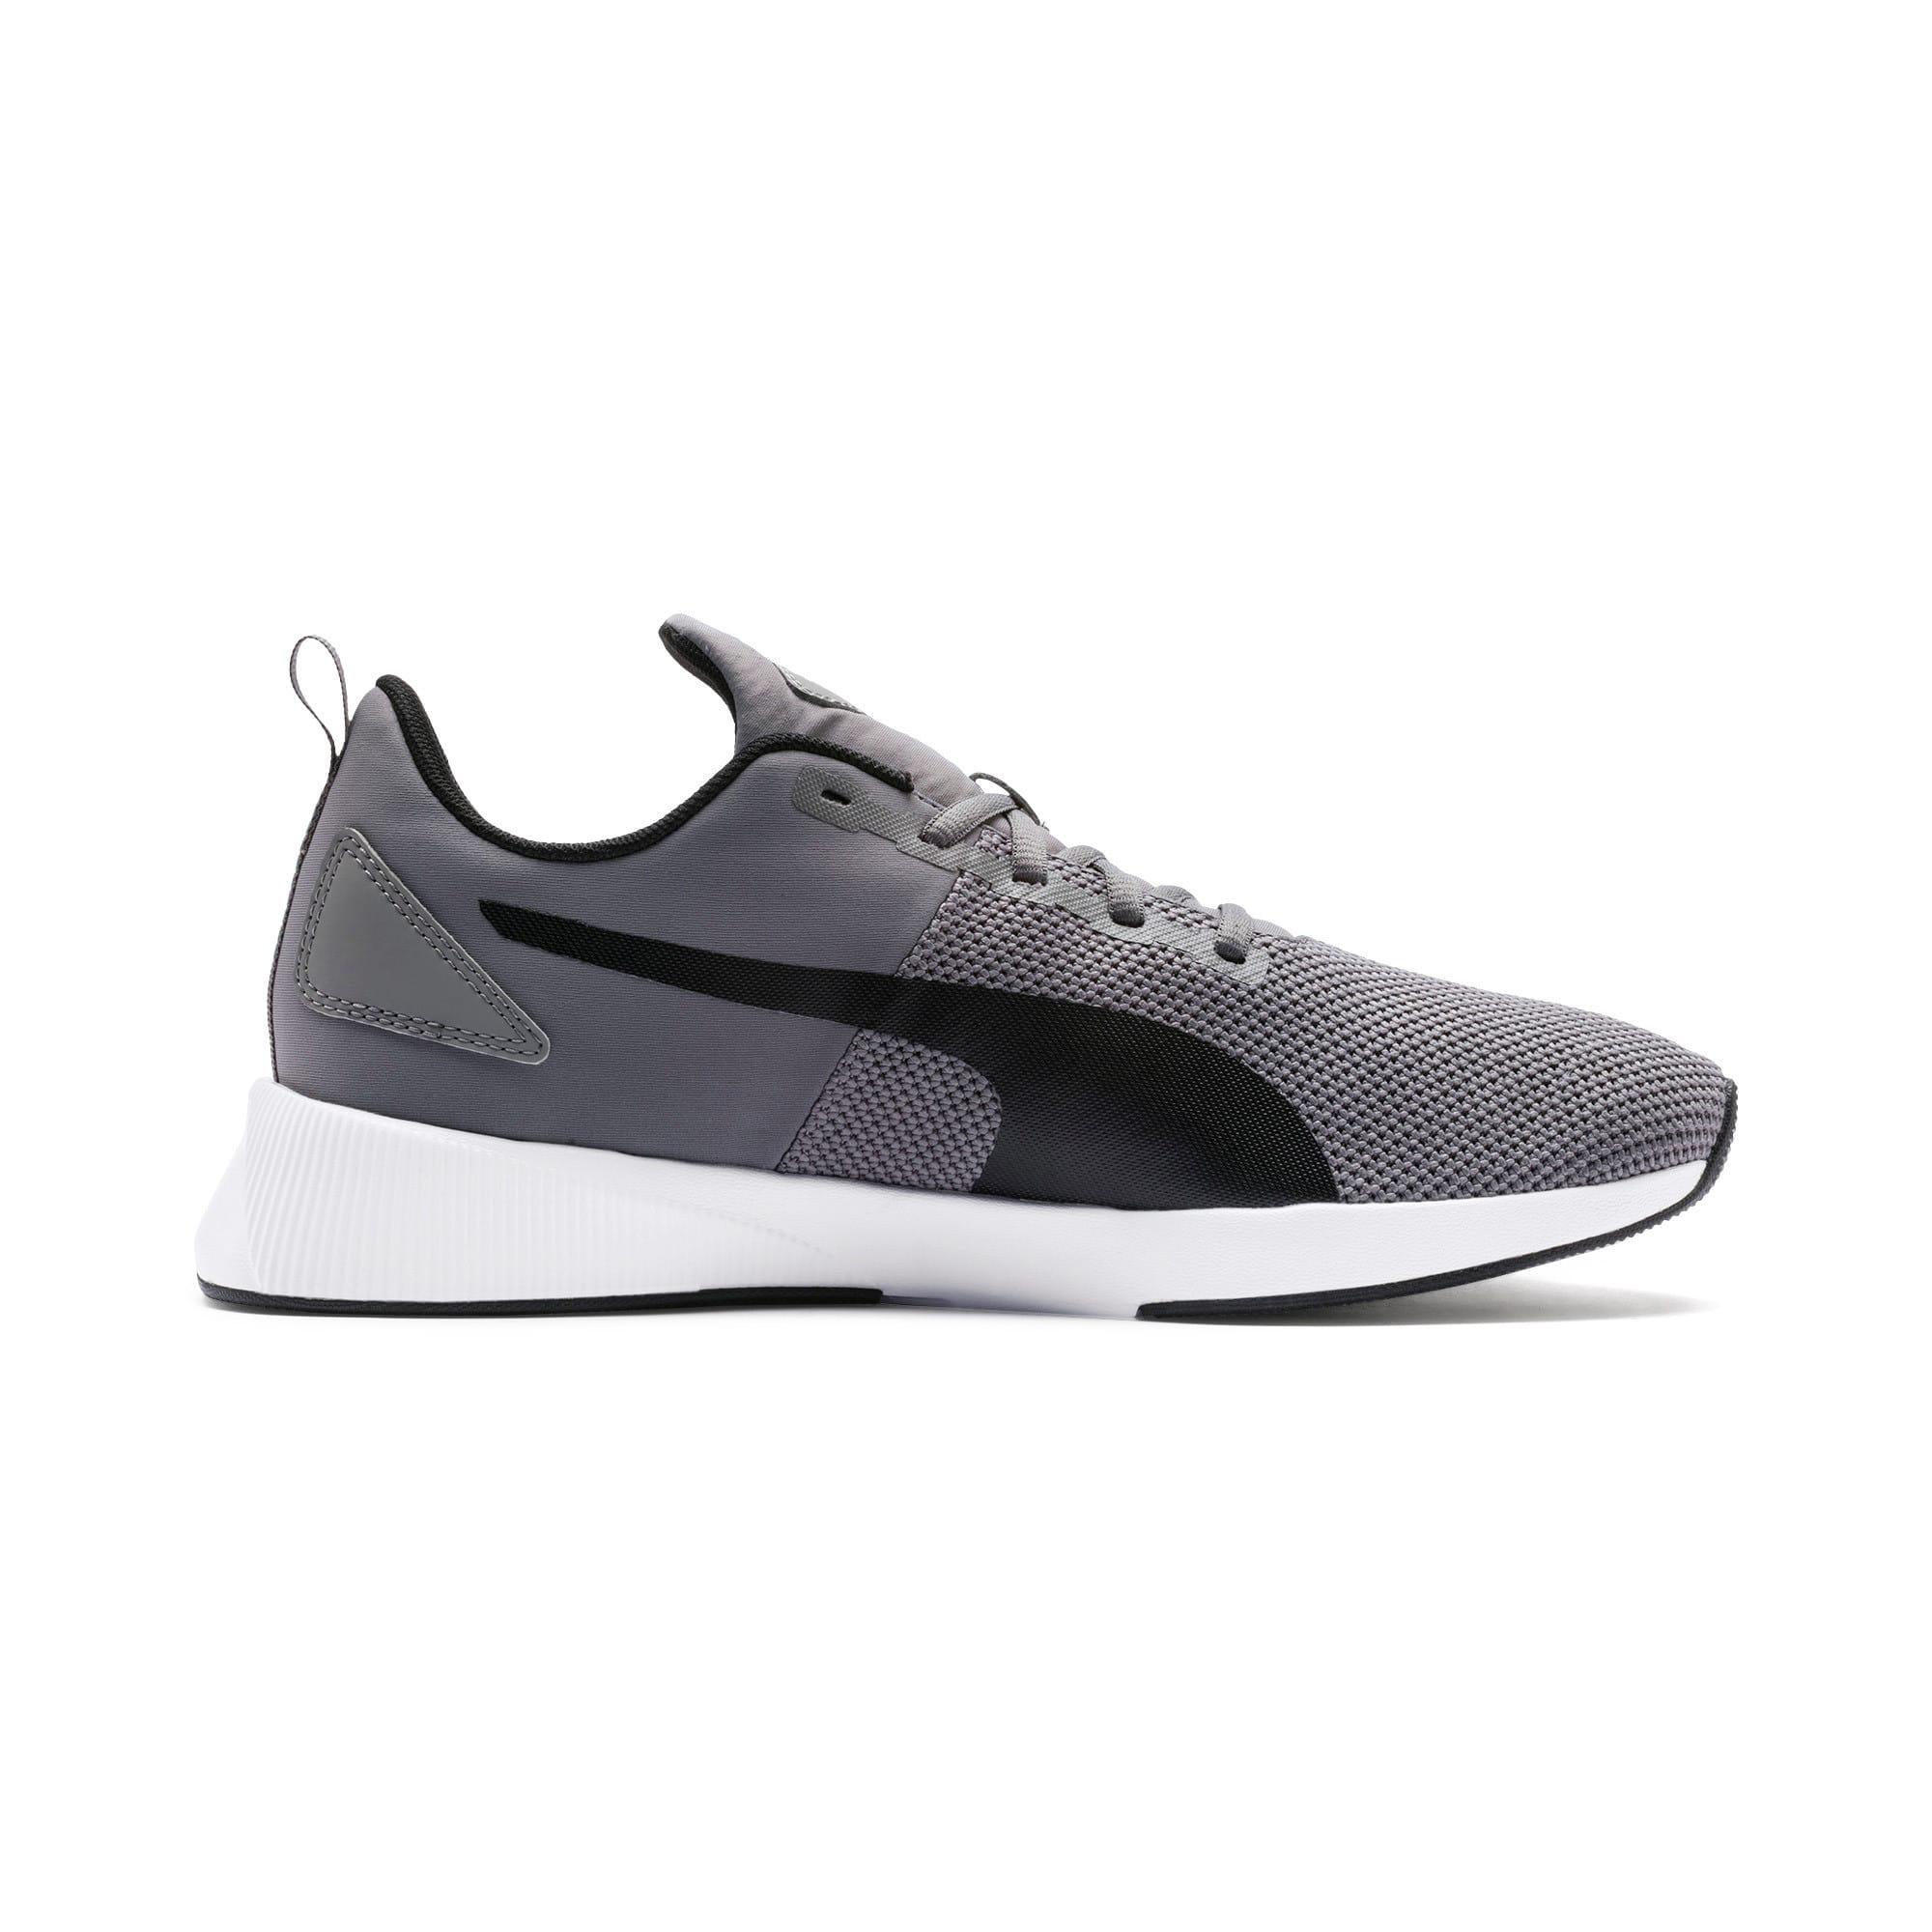 Thumbnail 6 of Flyer Runner Running Shoes, Charcoal-Black-Turquoise, medium